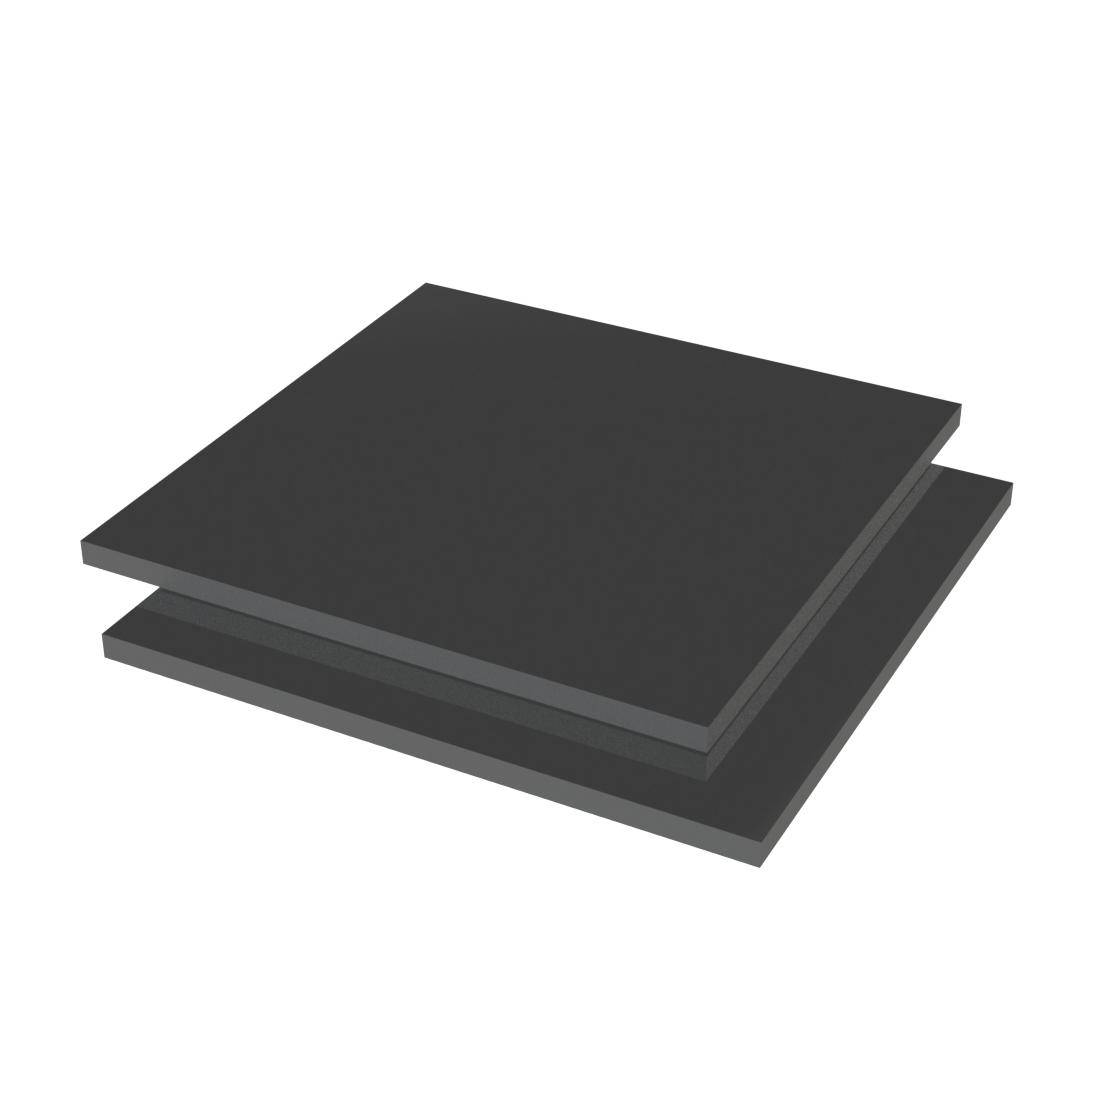 Kronoplan Kronoart HPL Plaat DZ Antraciet 0164bs 2800x2040x6mm